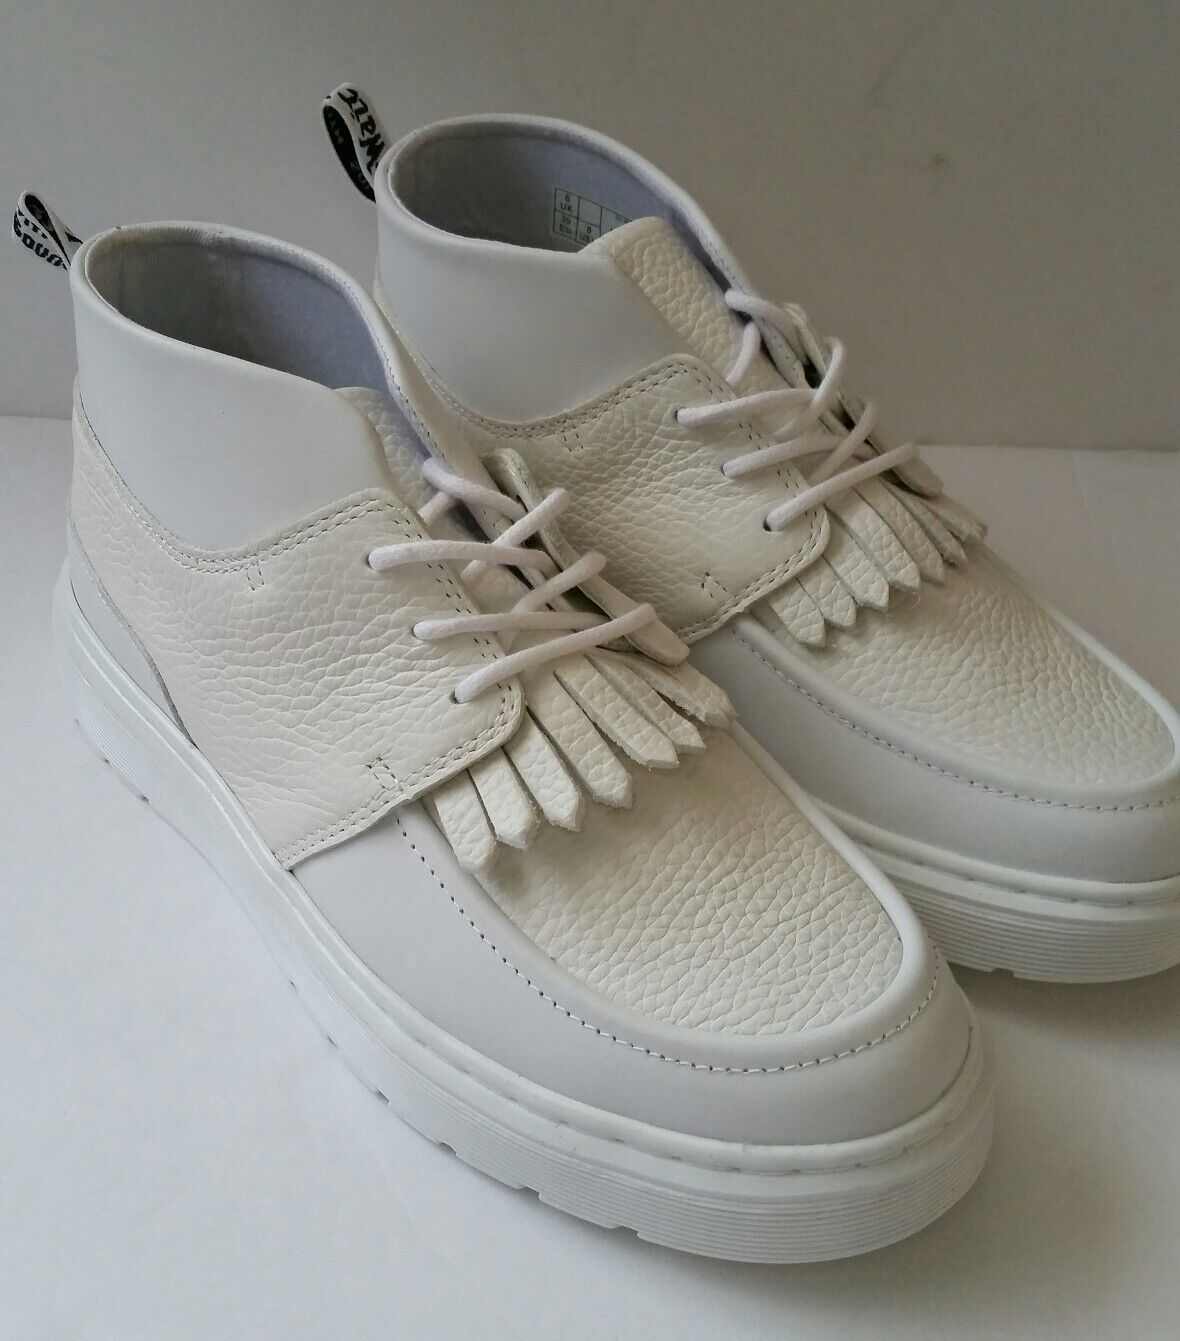 Dr. Martens AIRWAIR Jemima para Mujer 8 blancoo Cuero Chukka Tenis botas flecos Nuevo